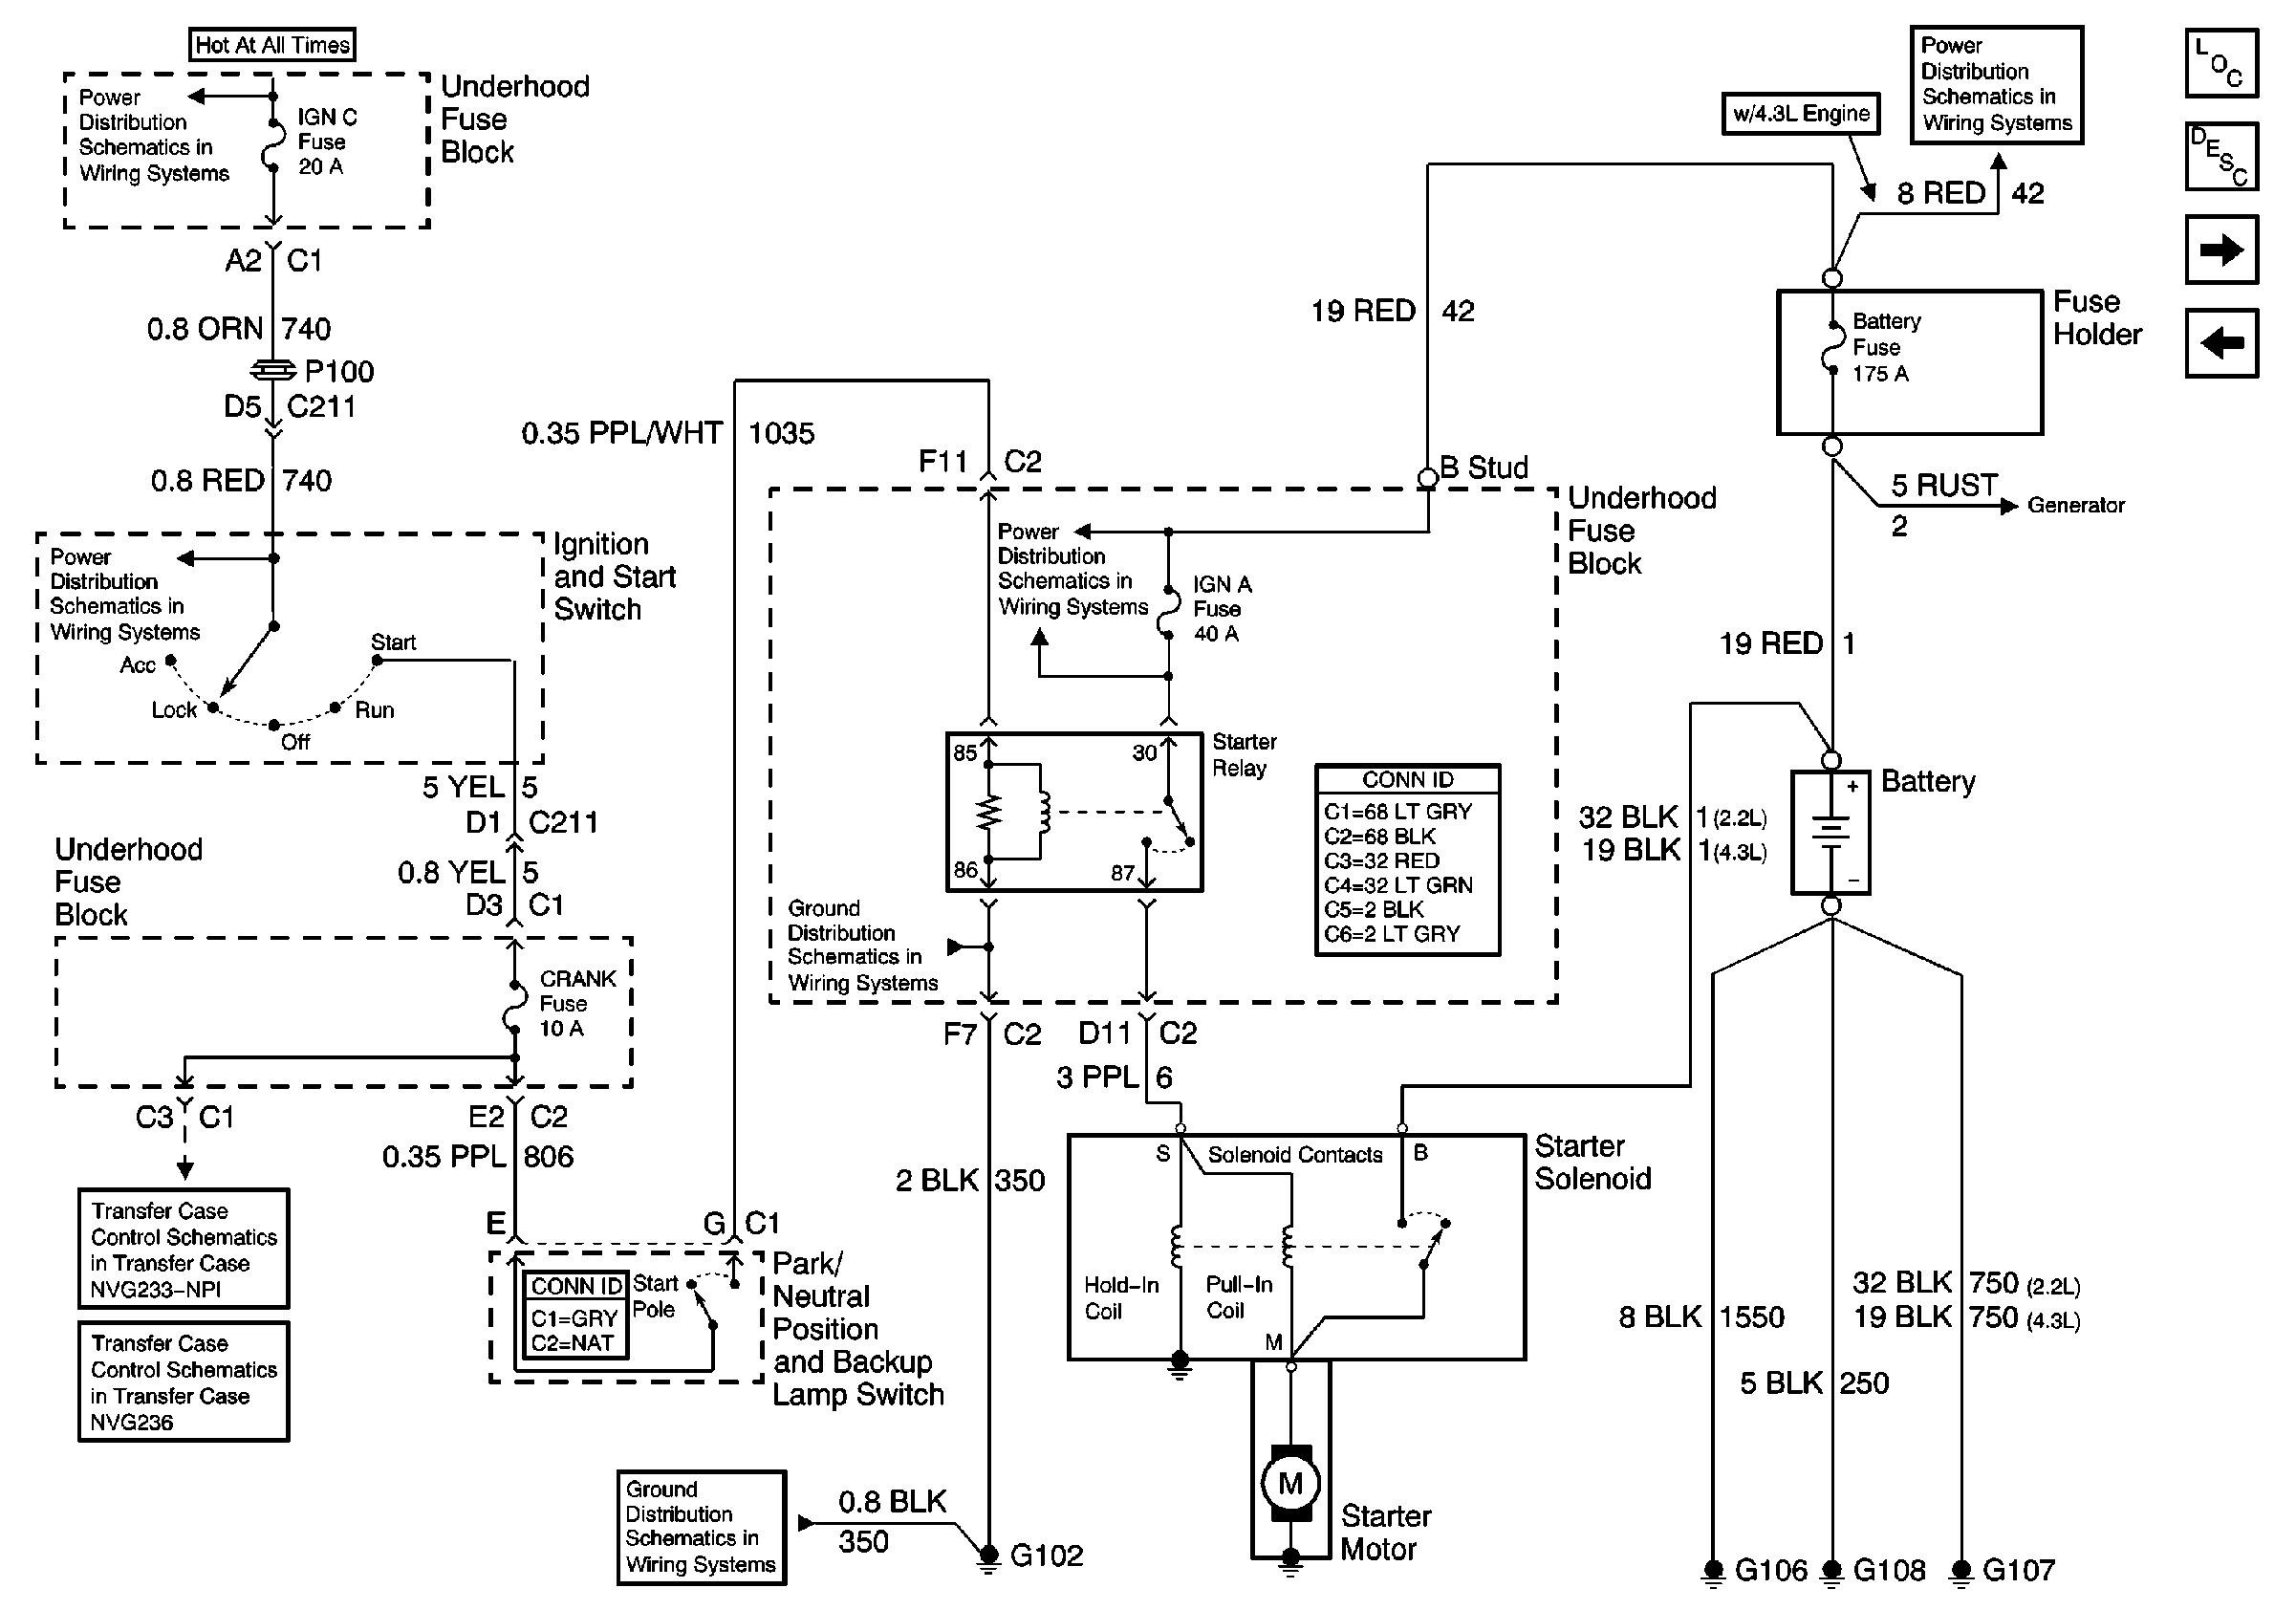 2000 Chevy S10 Alternator Wiring Diagram Wiring Diagram Local D Local D Maceratadoc It